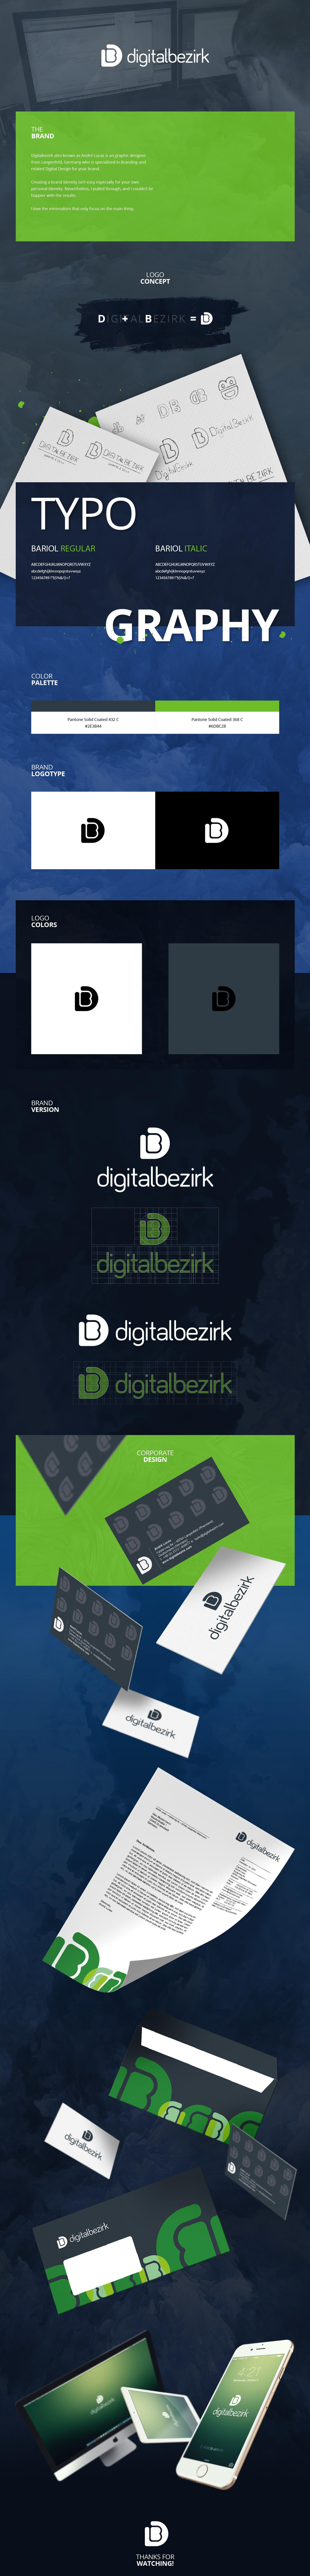 digitalbezirk digital design print logo identity corporate Mockup andre lucas graphic designer grid mark brand